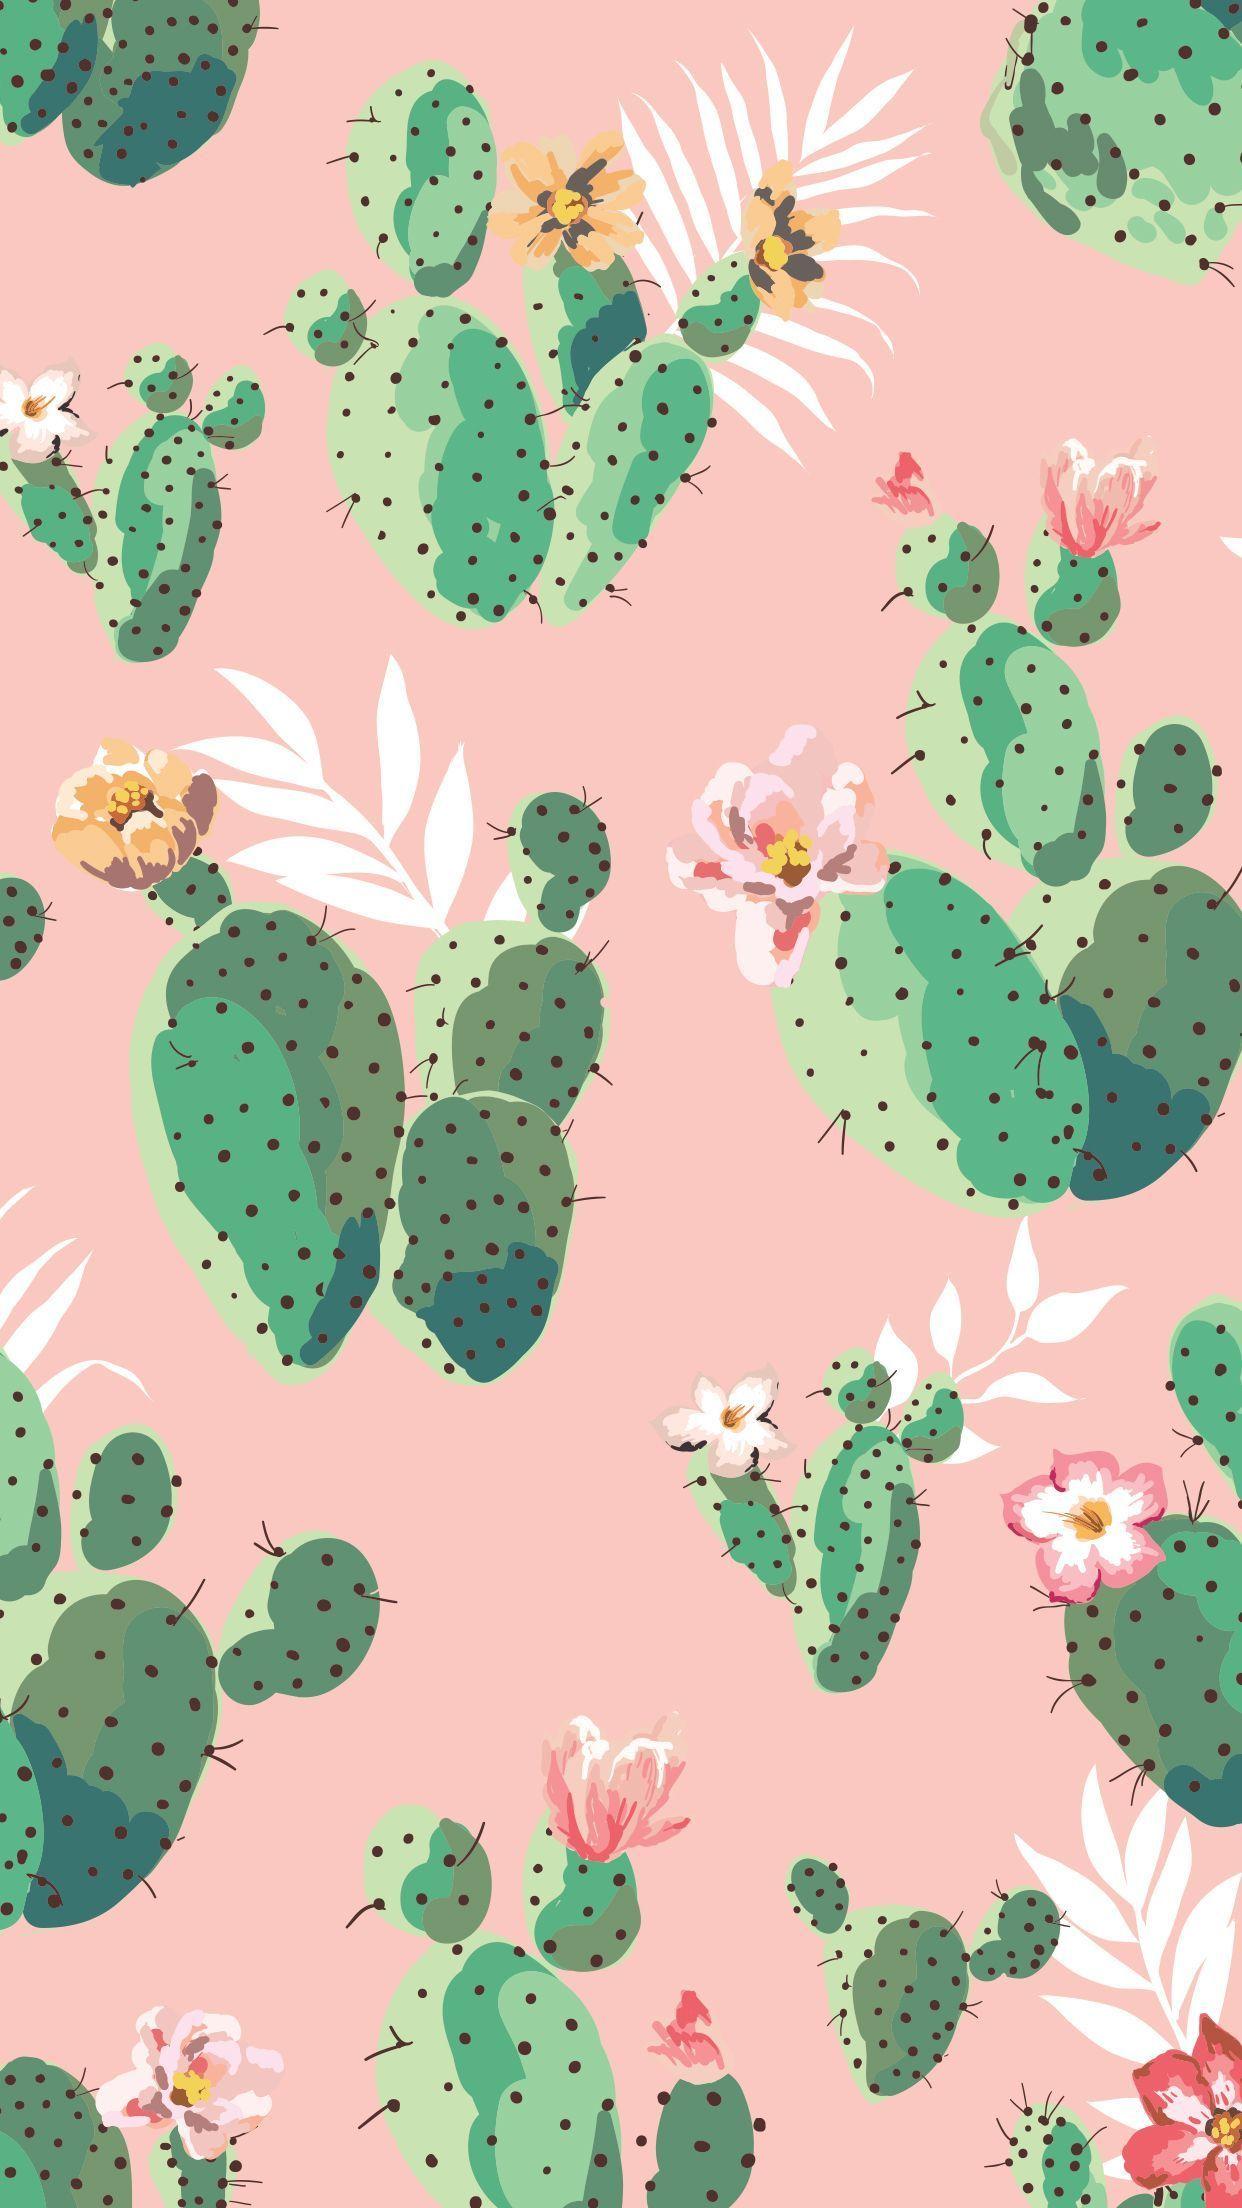 Cute Aesthetic Cactus Wallpapers Wallpaper Cave